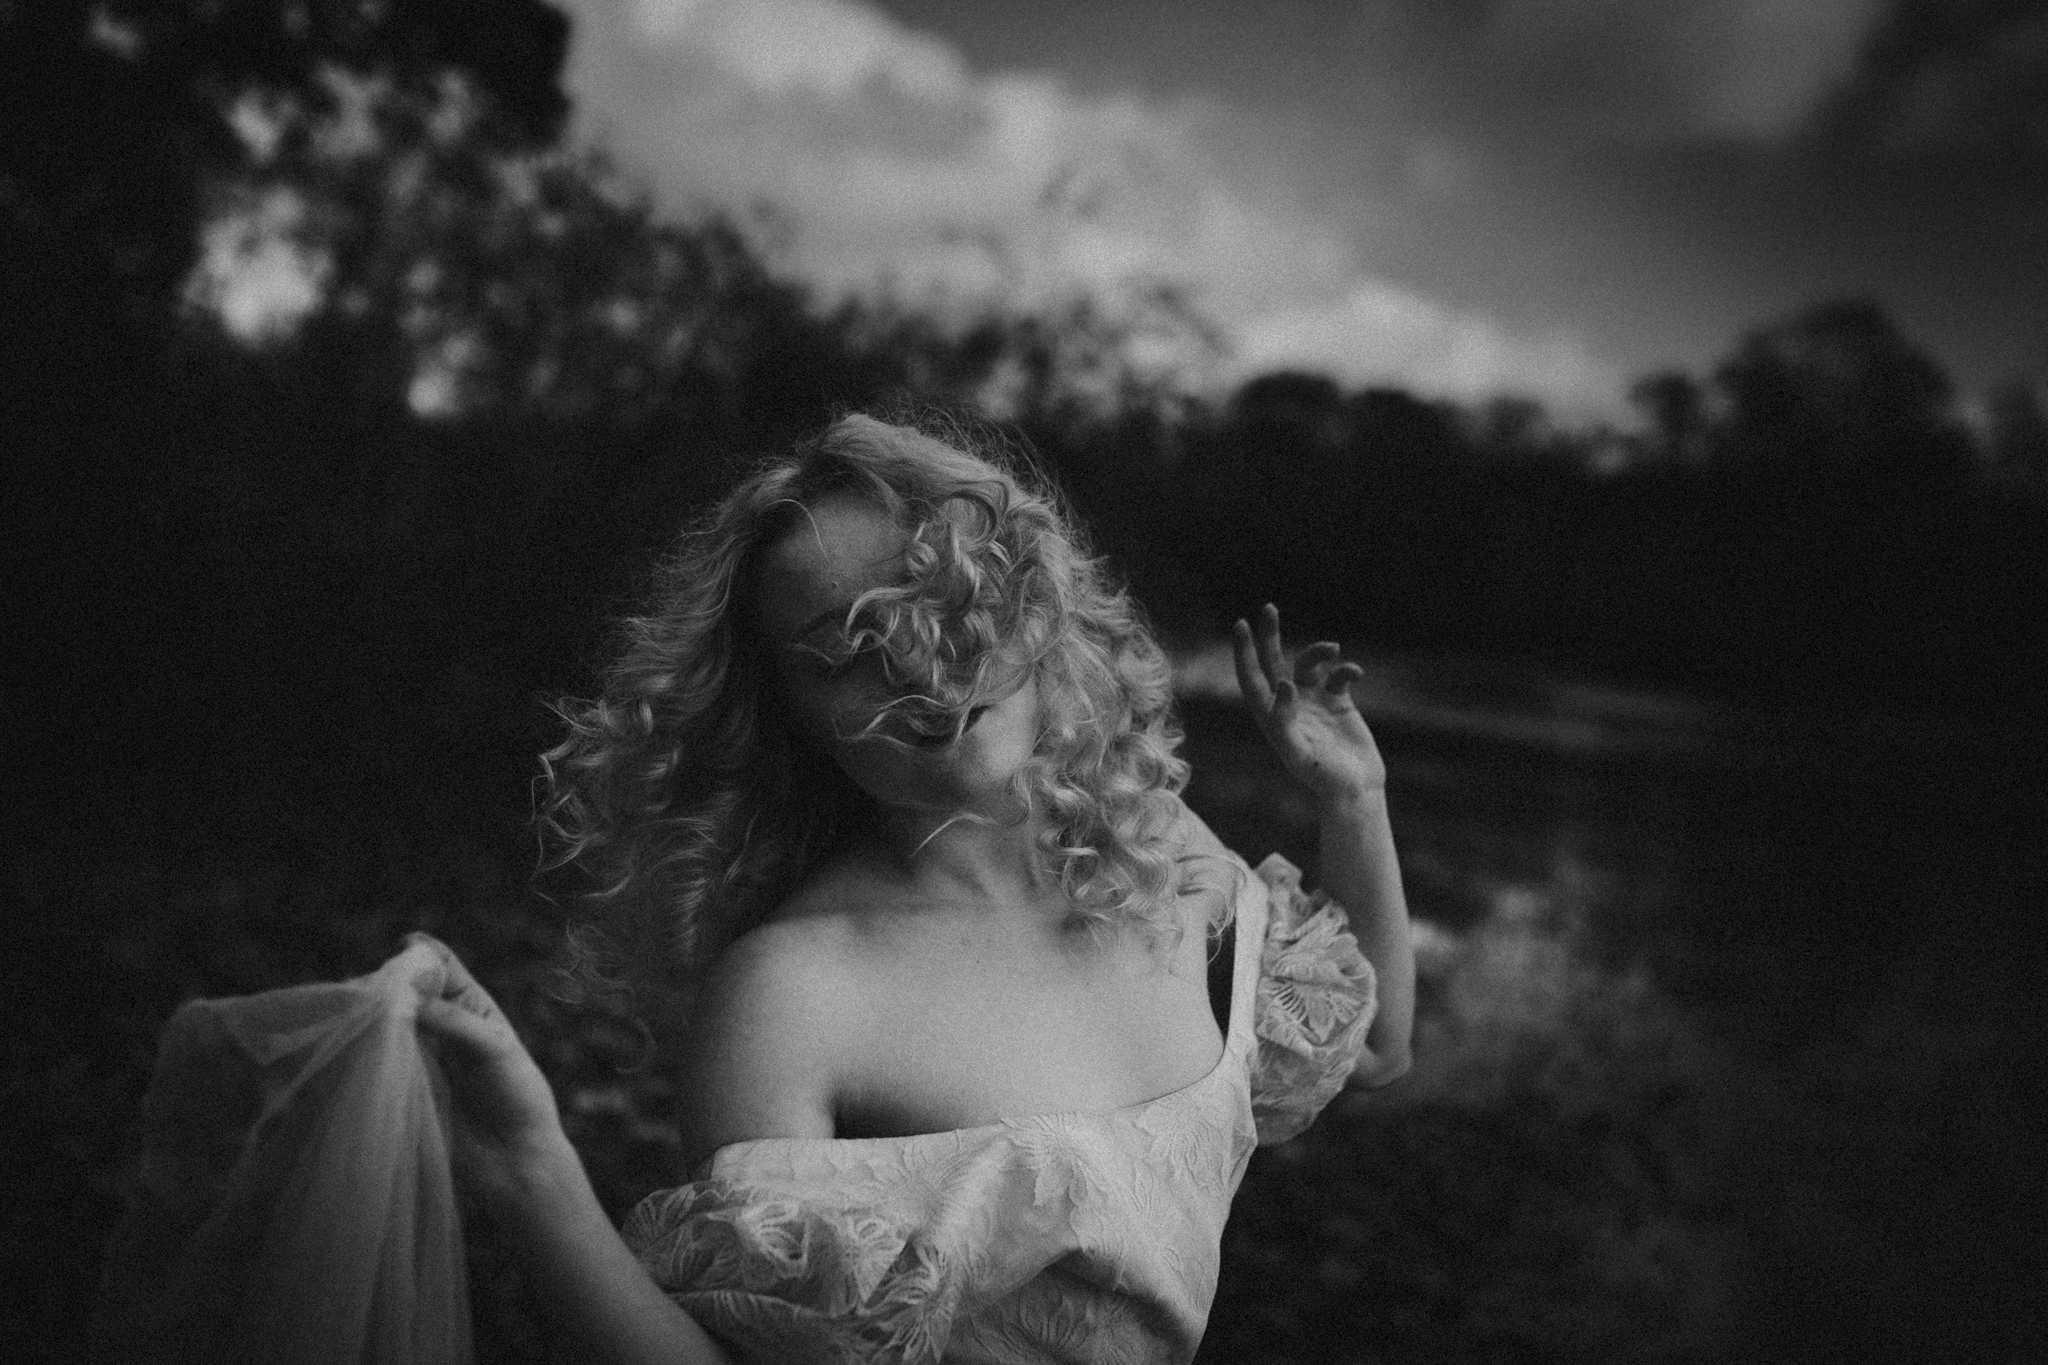 pale-witch-257fb.jpg